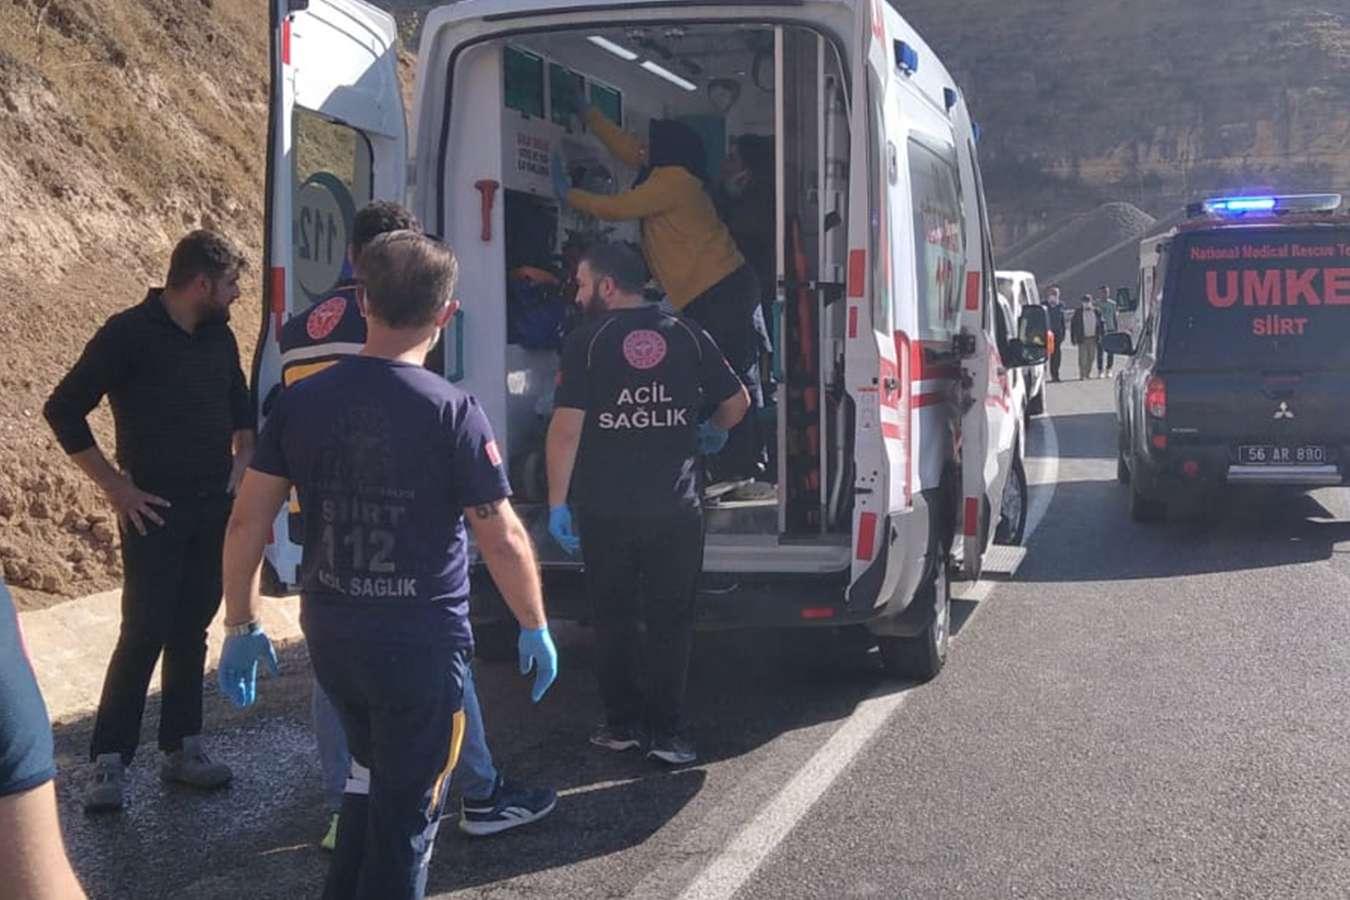 Siirt'te saman yüklü tır devrildi: 2 yaralı